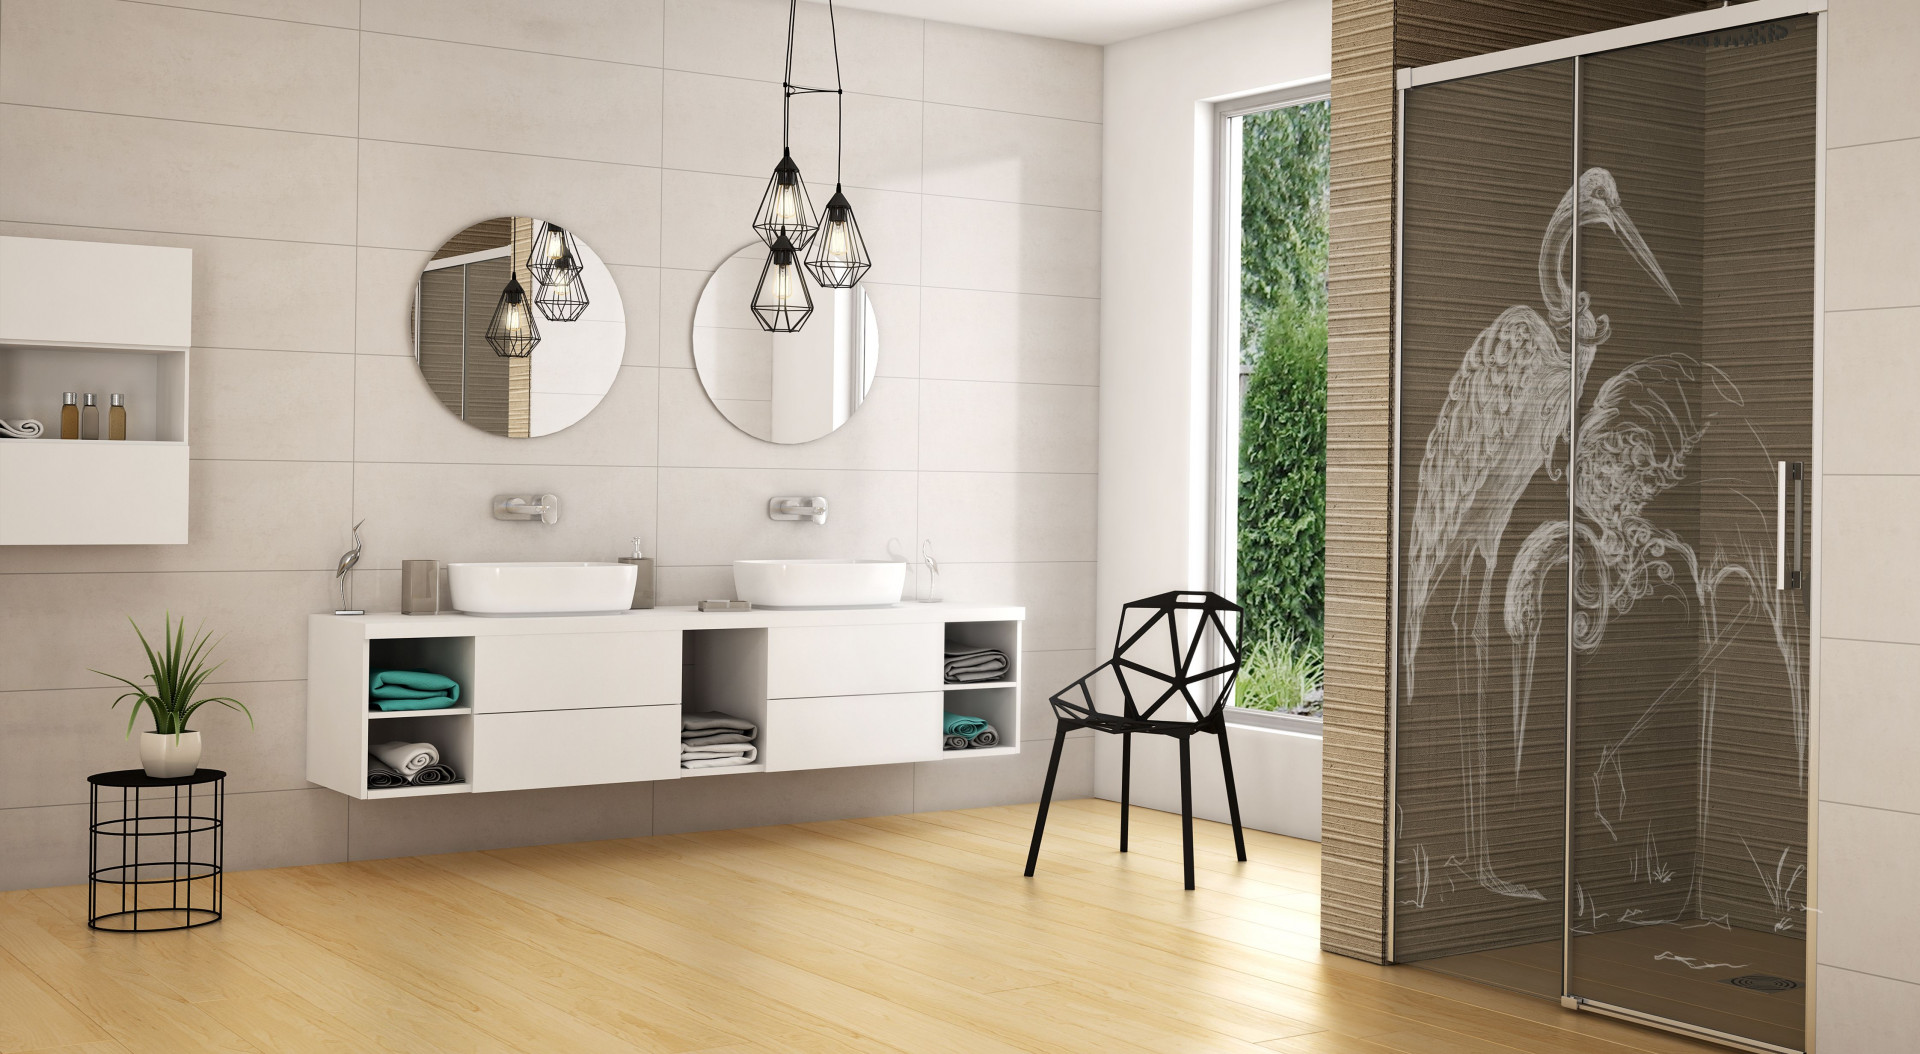 Nowoczesna strefa prysznica: 12 modeli kabin